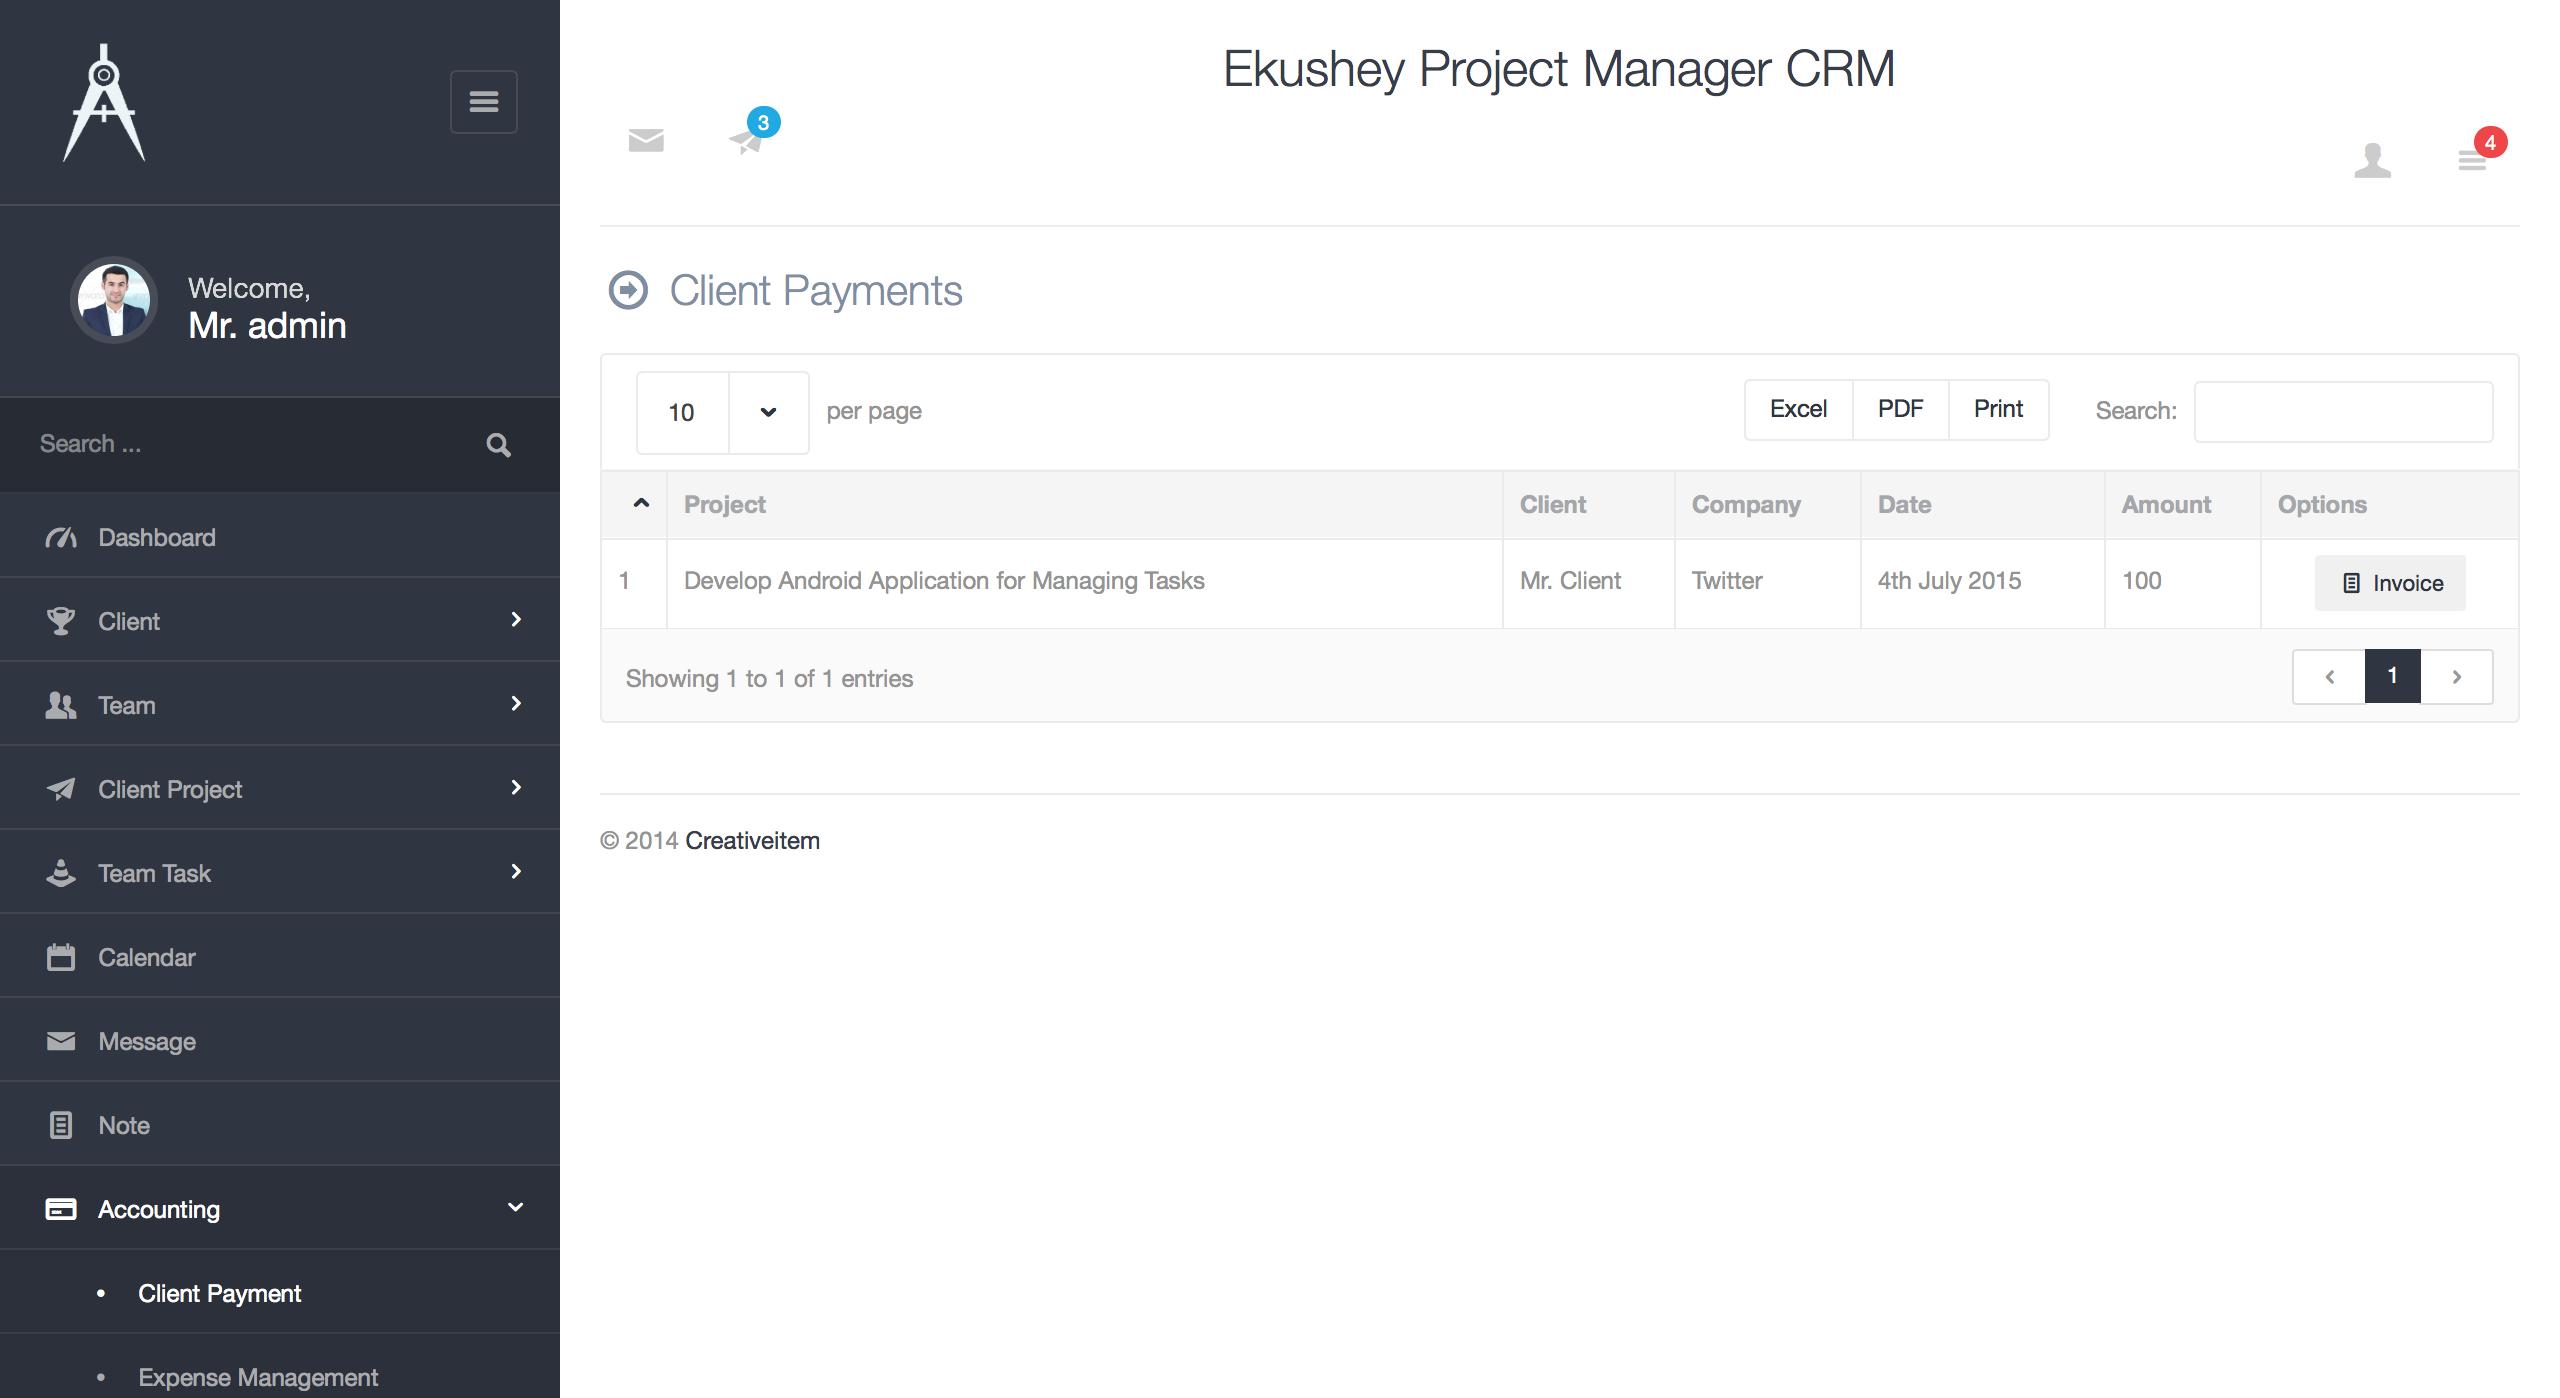 ekushey project manager crm by creativeitem codecanyon projectmanagerscreenshots v2 manage client payments png projectmanagerscreenshots